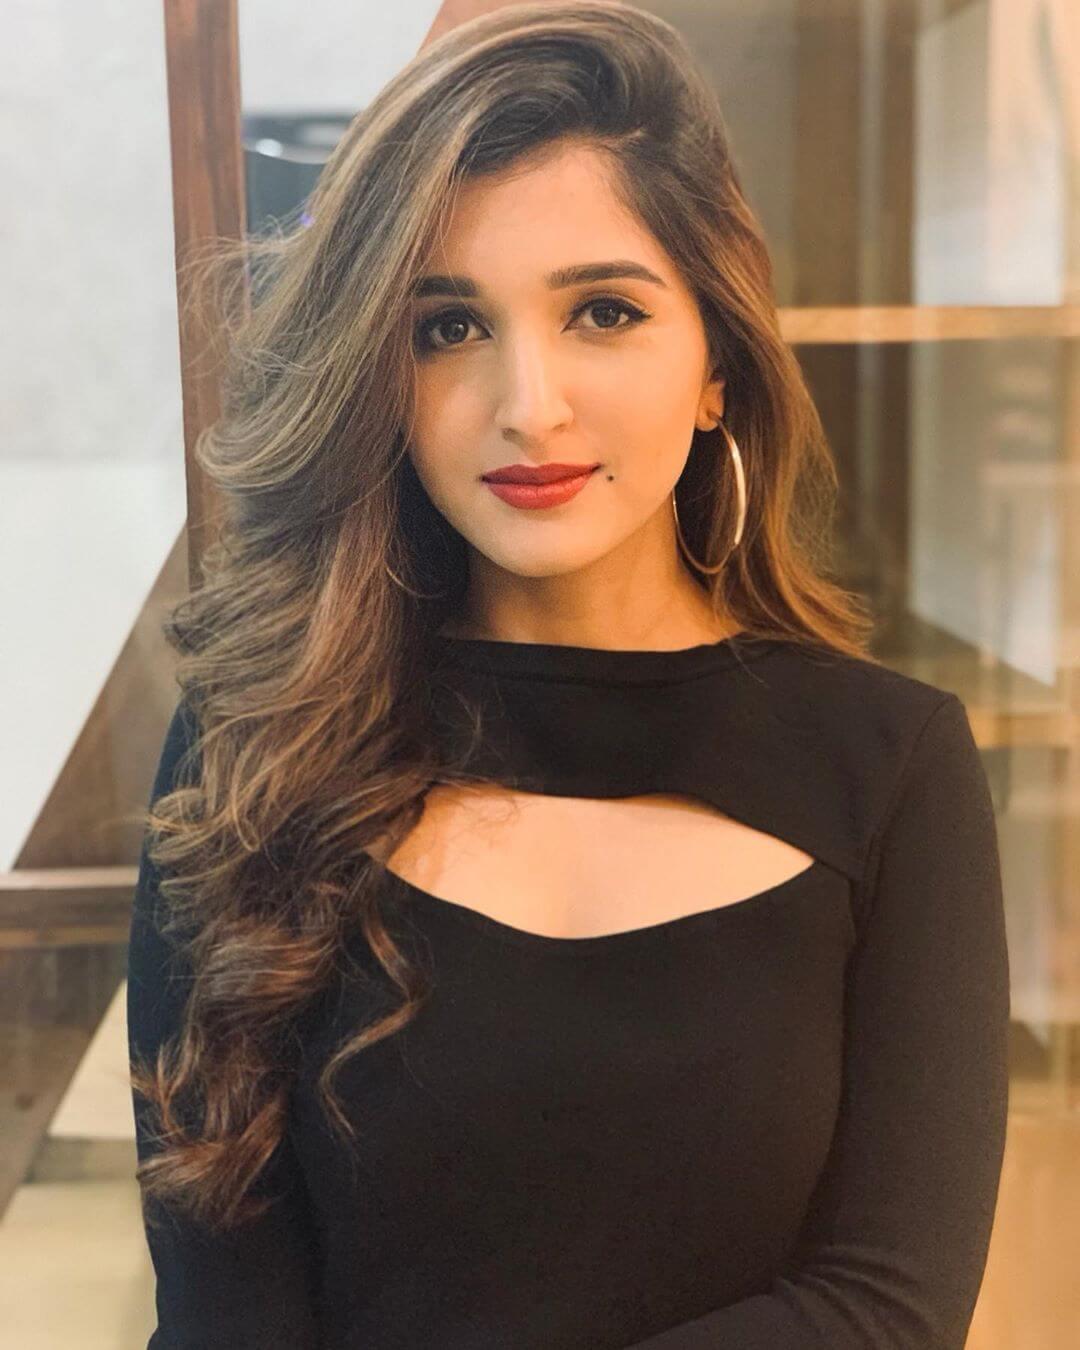 nidhi shah actress kartik purnima